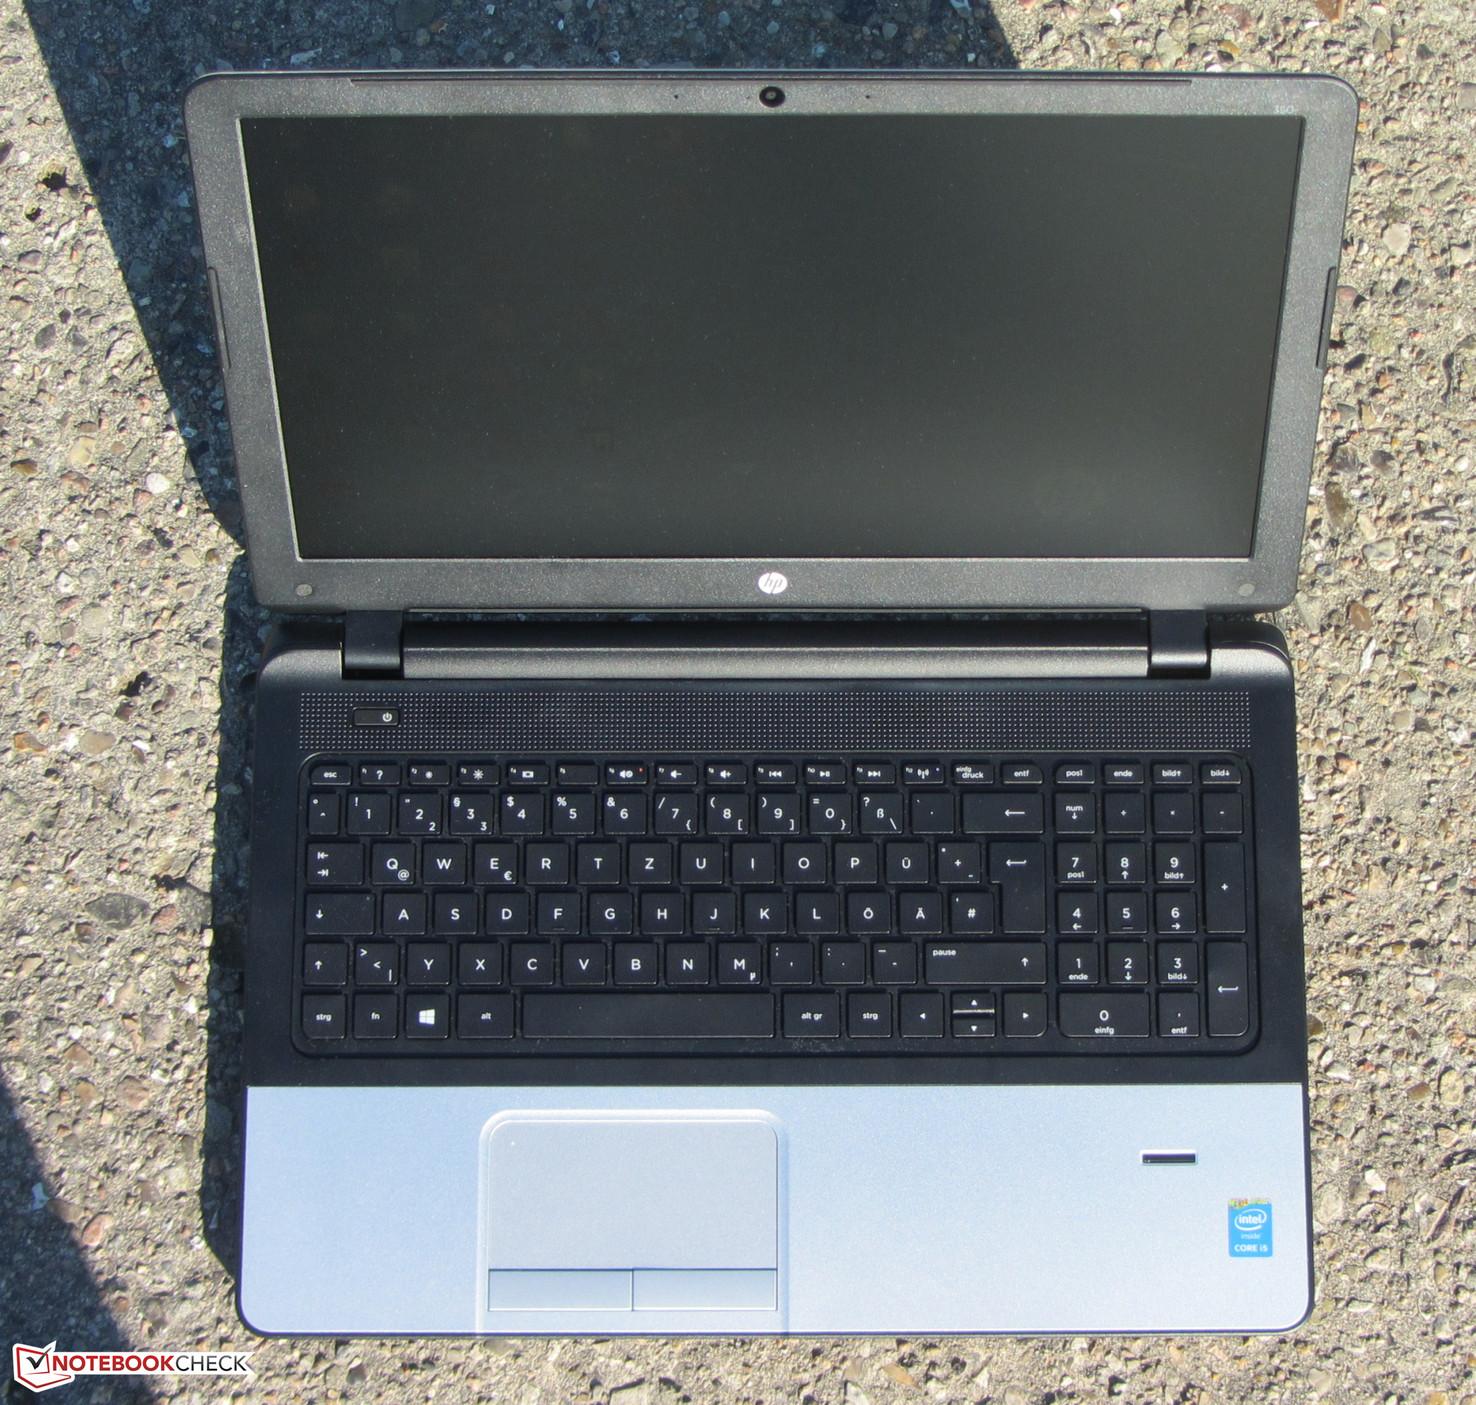 http://www.notebookcheck.com/fileadmin/_processed_/csm_HP_350_G2_Ansicht7_9e10ca355c.jpg